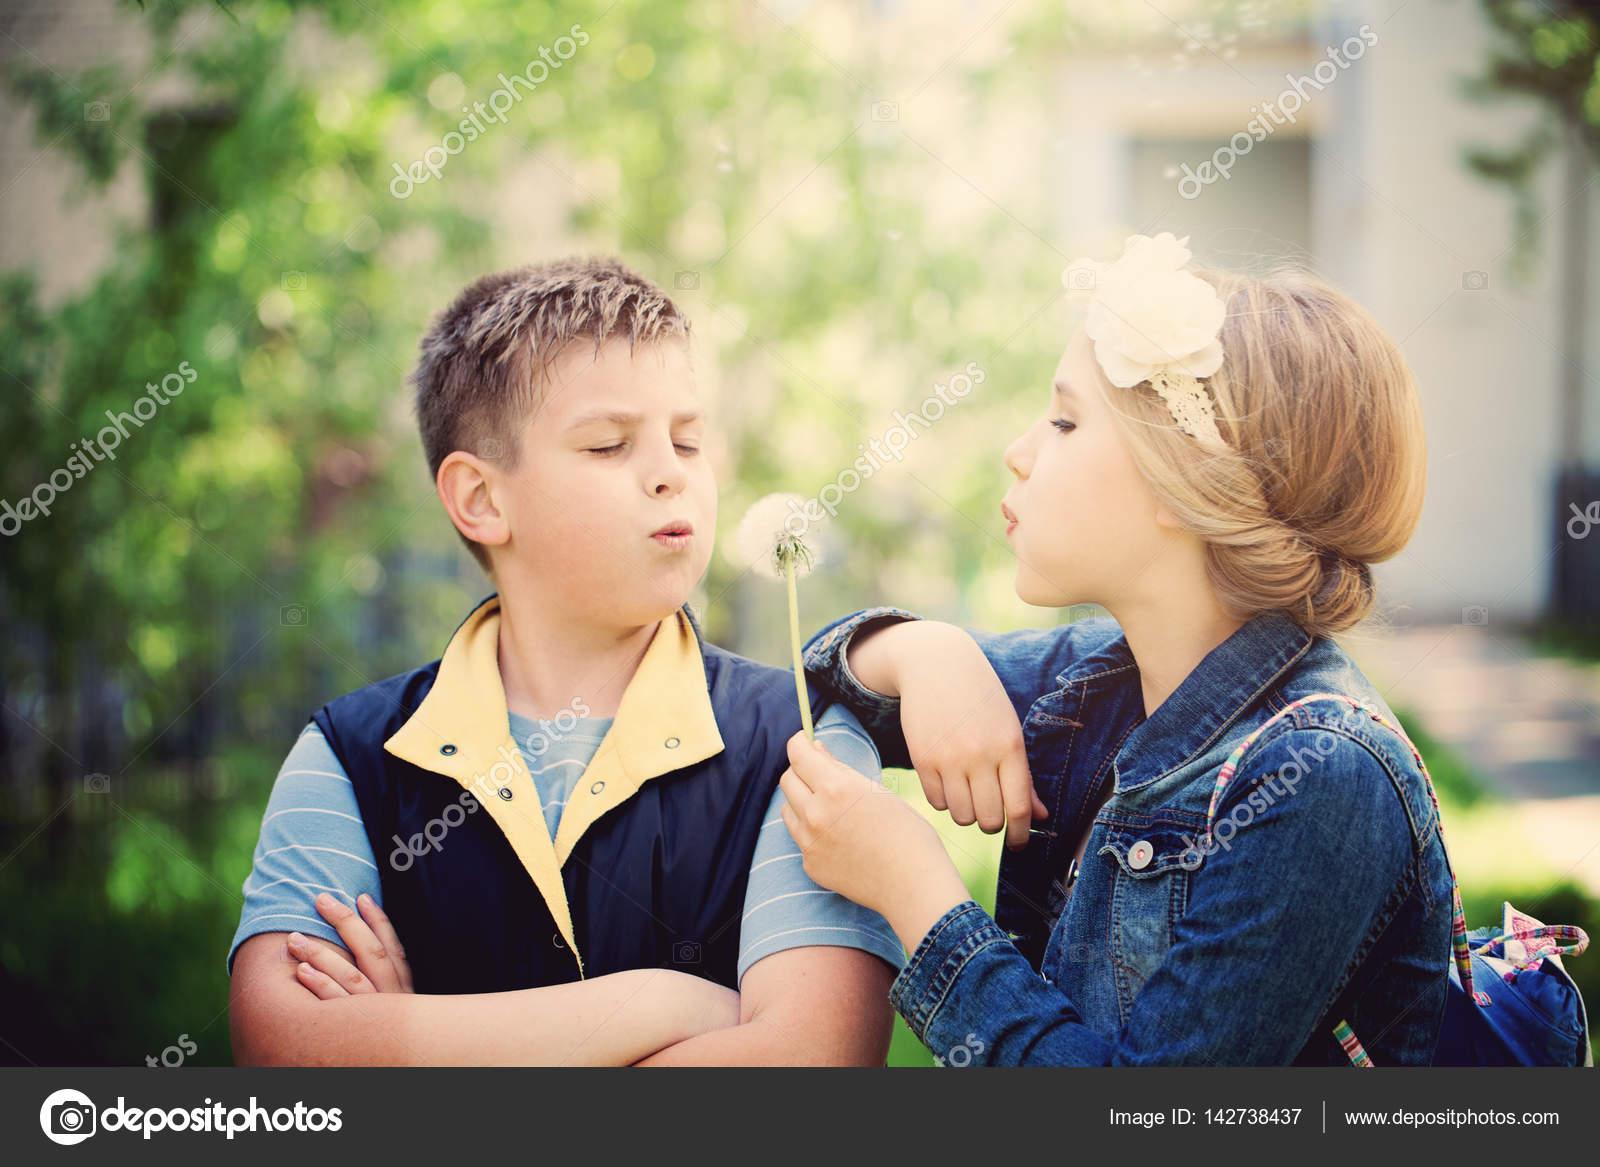 c53903dac0a Νεαρό αγόρι και κορίτσι φυσάει ένα άνθη πικραλίδα. Ευτυχής παιδιά ...